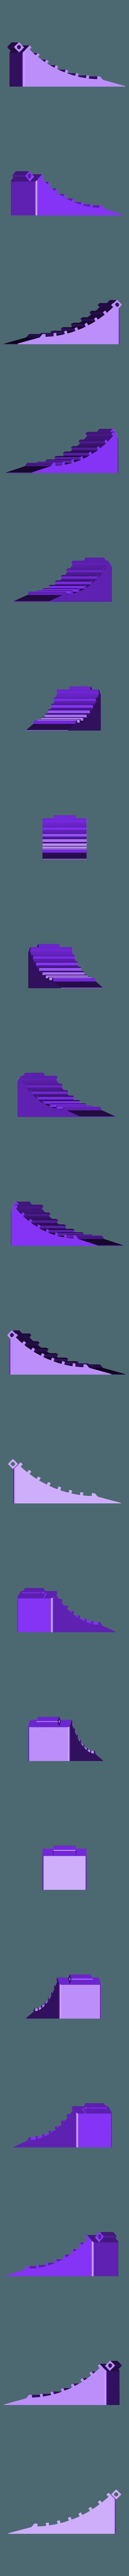 bridge pied crans 1.6 SX24.STL Download STL file Axial SCX24 Crawler high bridge • 3D print model, lulu3Dbuilder